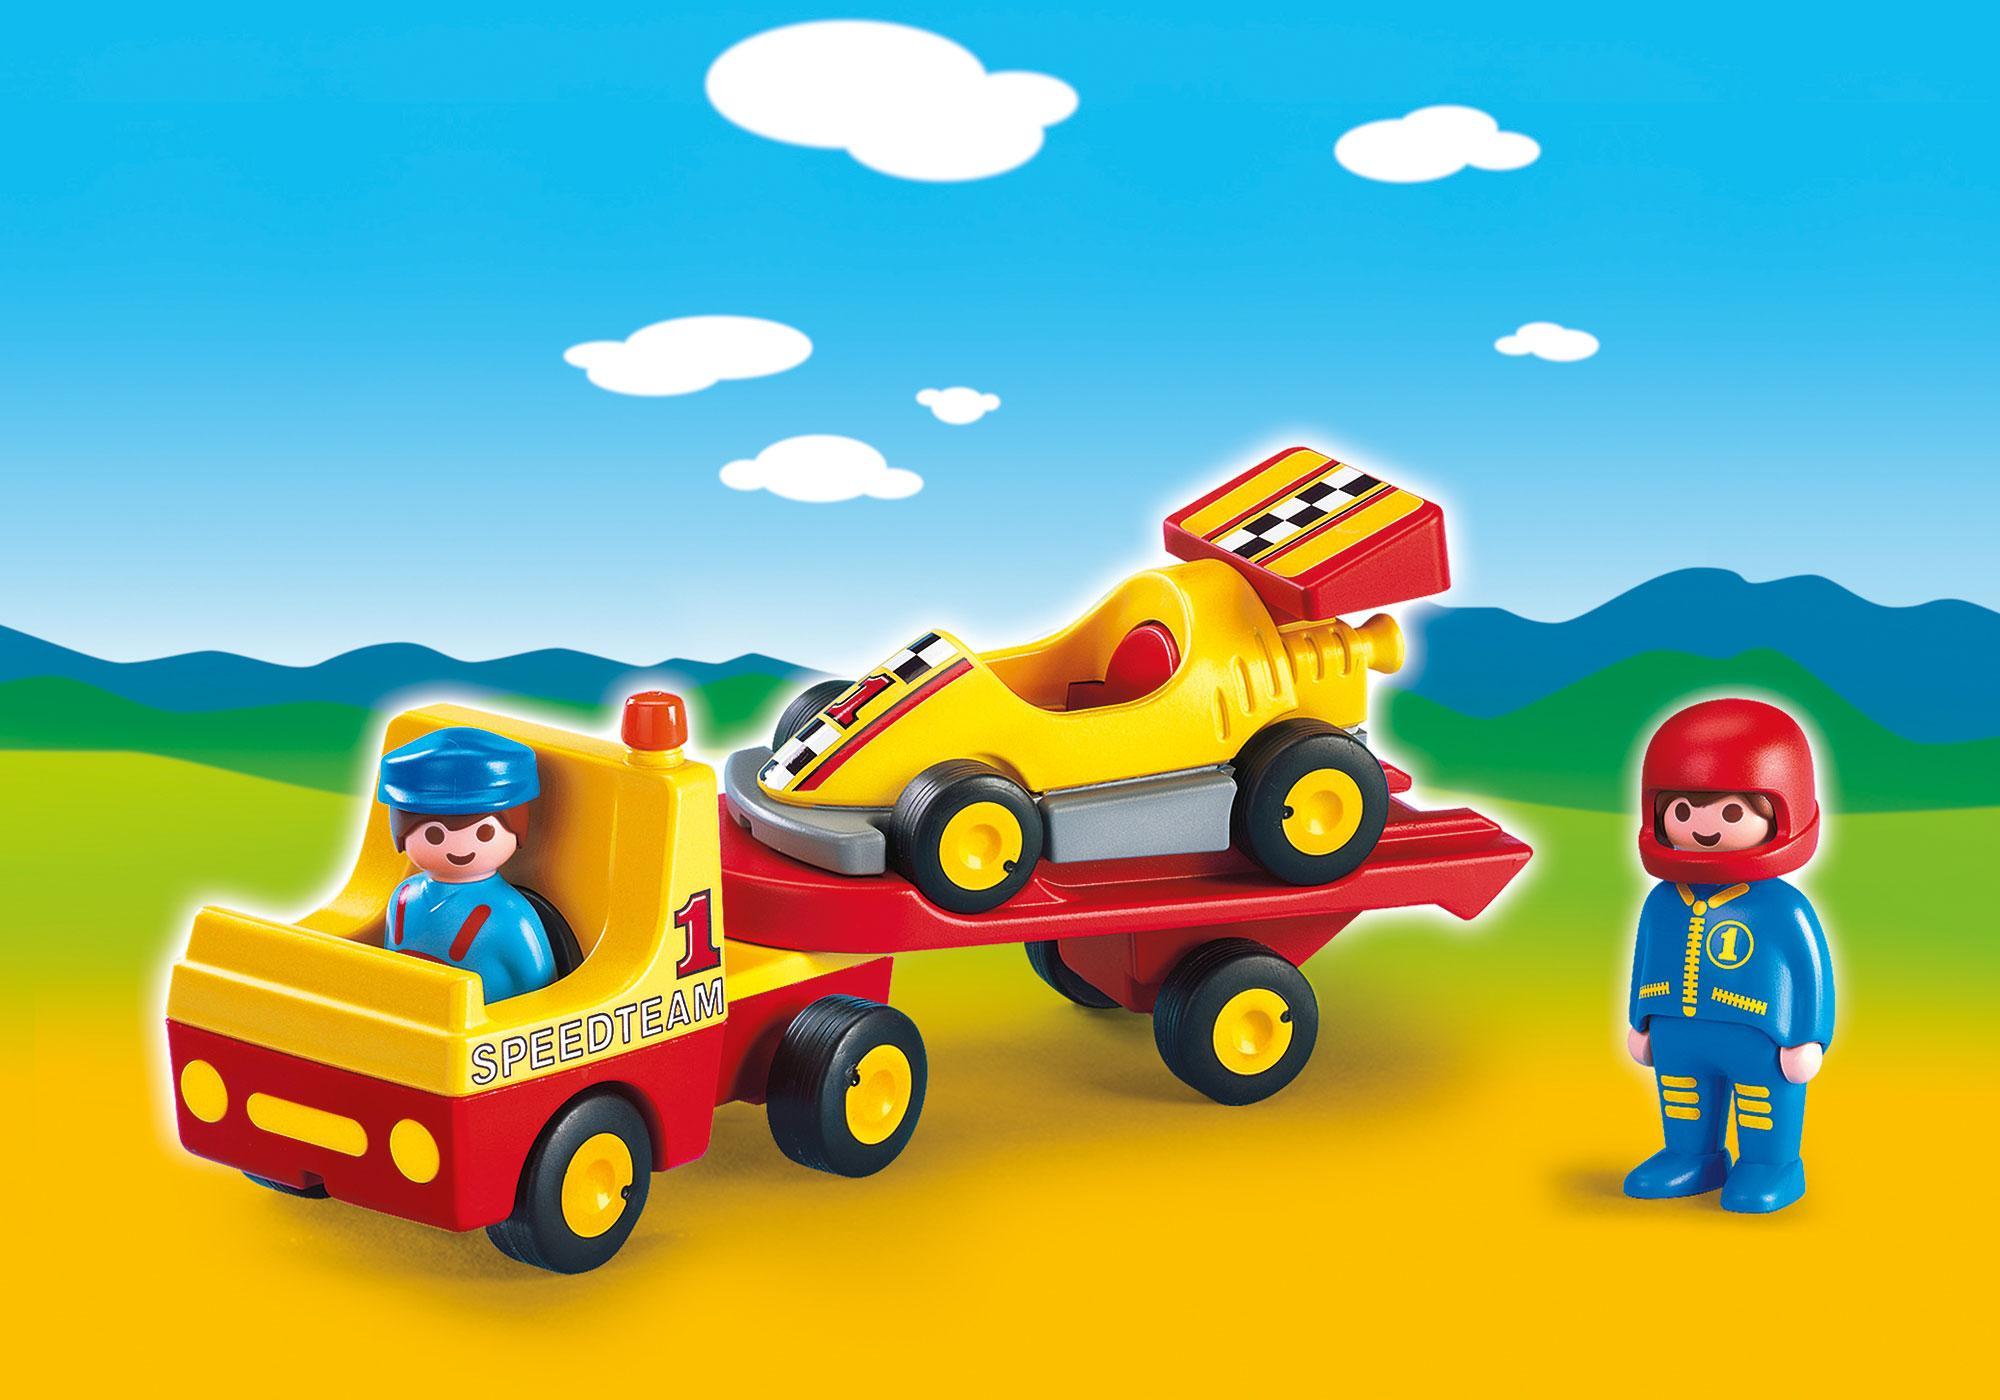 http://media.playmobil.com/i/playmobil/6761_product_detail/Racing Car with Transporter